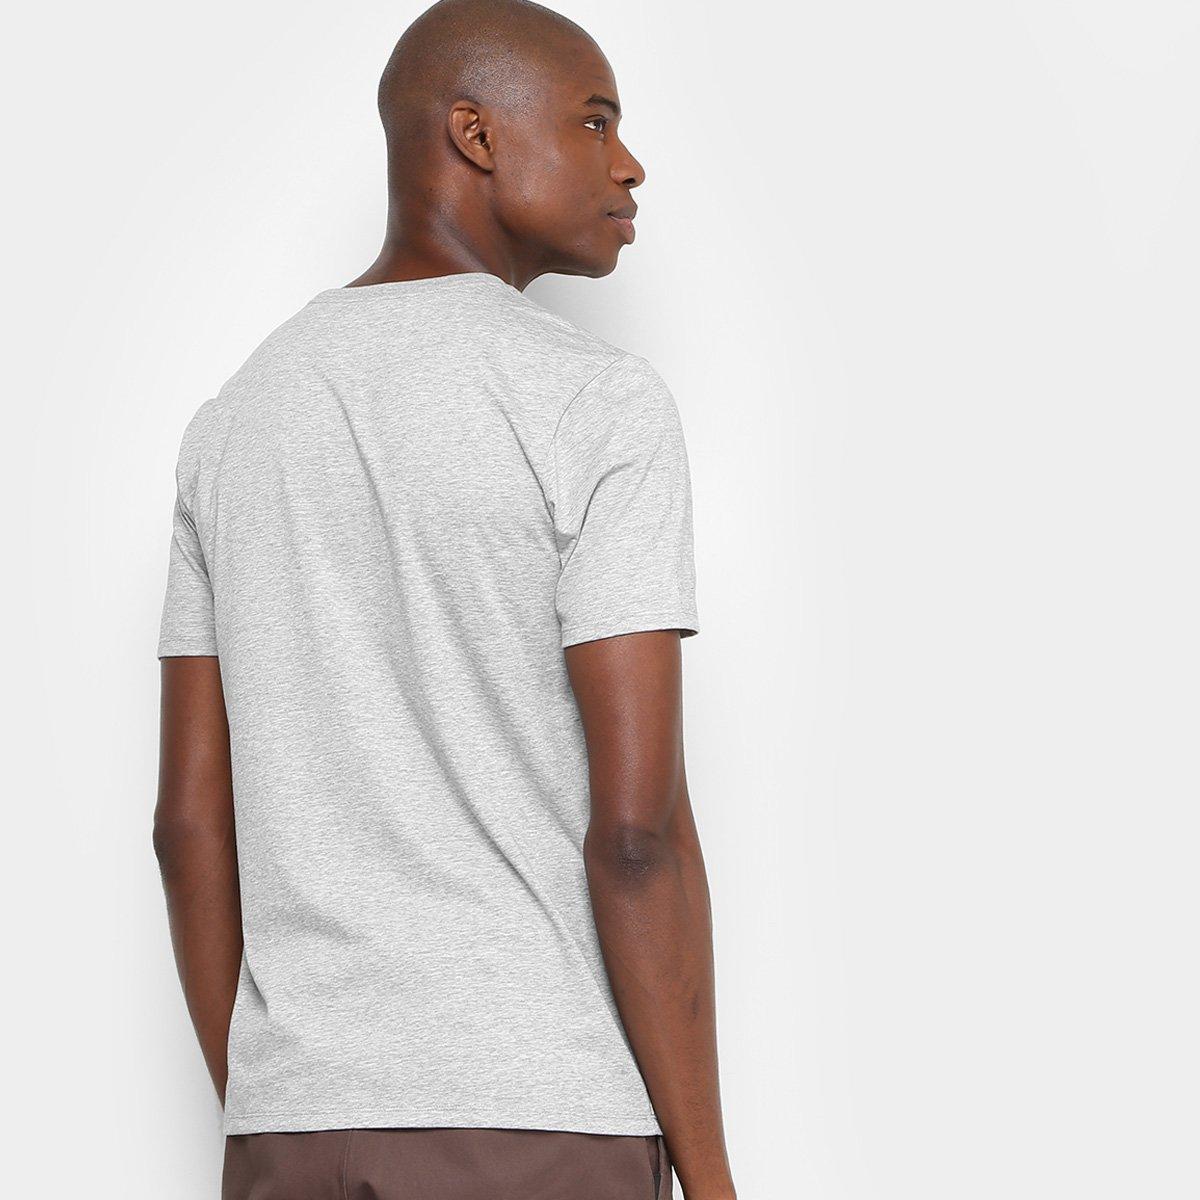 2370fde56a Camiseta Nike Sb Dry Dfc Camo Masculina - Compre Agora